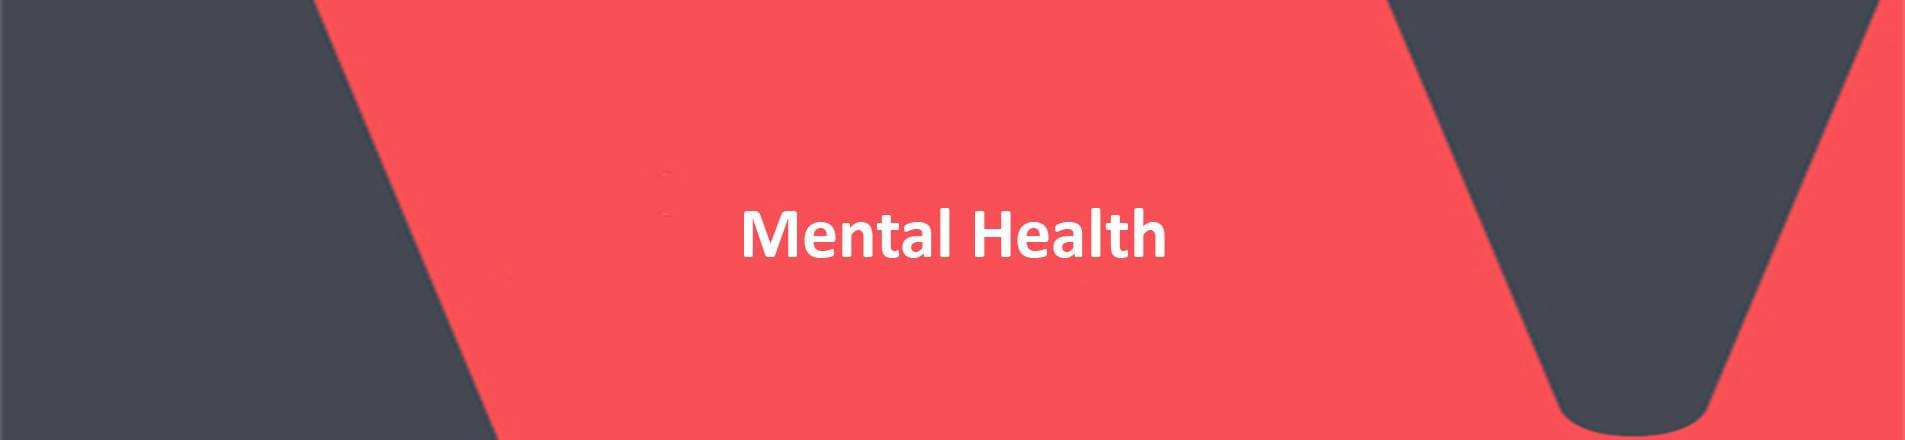 Mental Health.